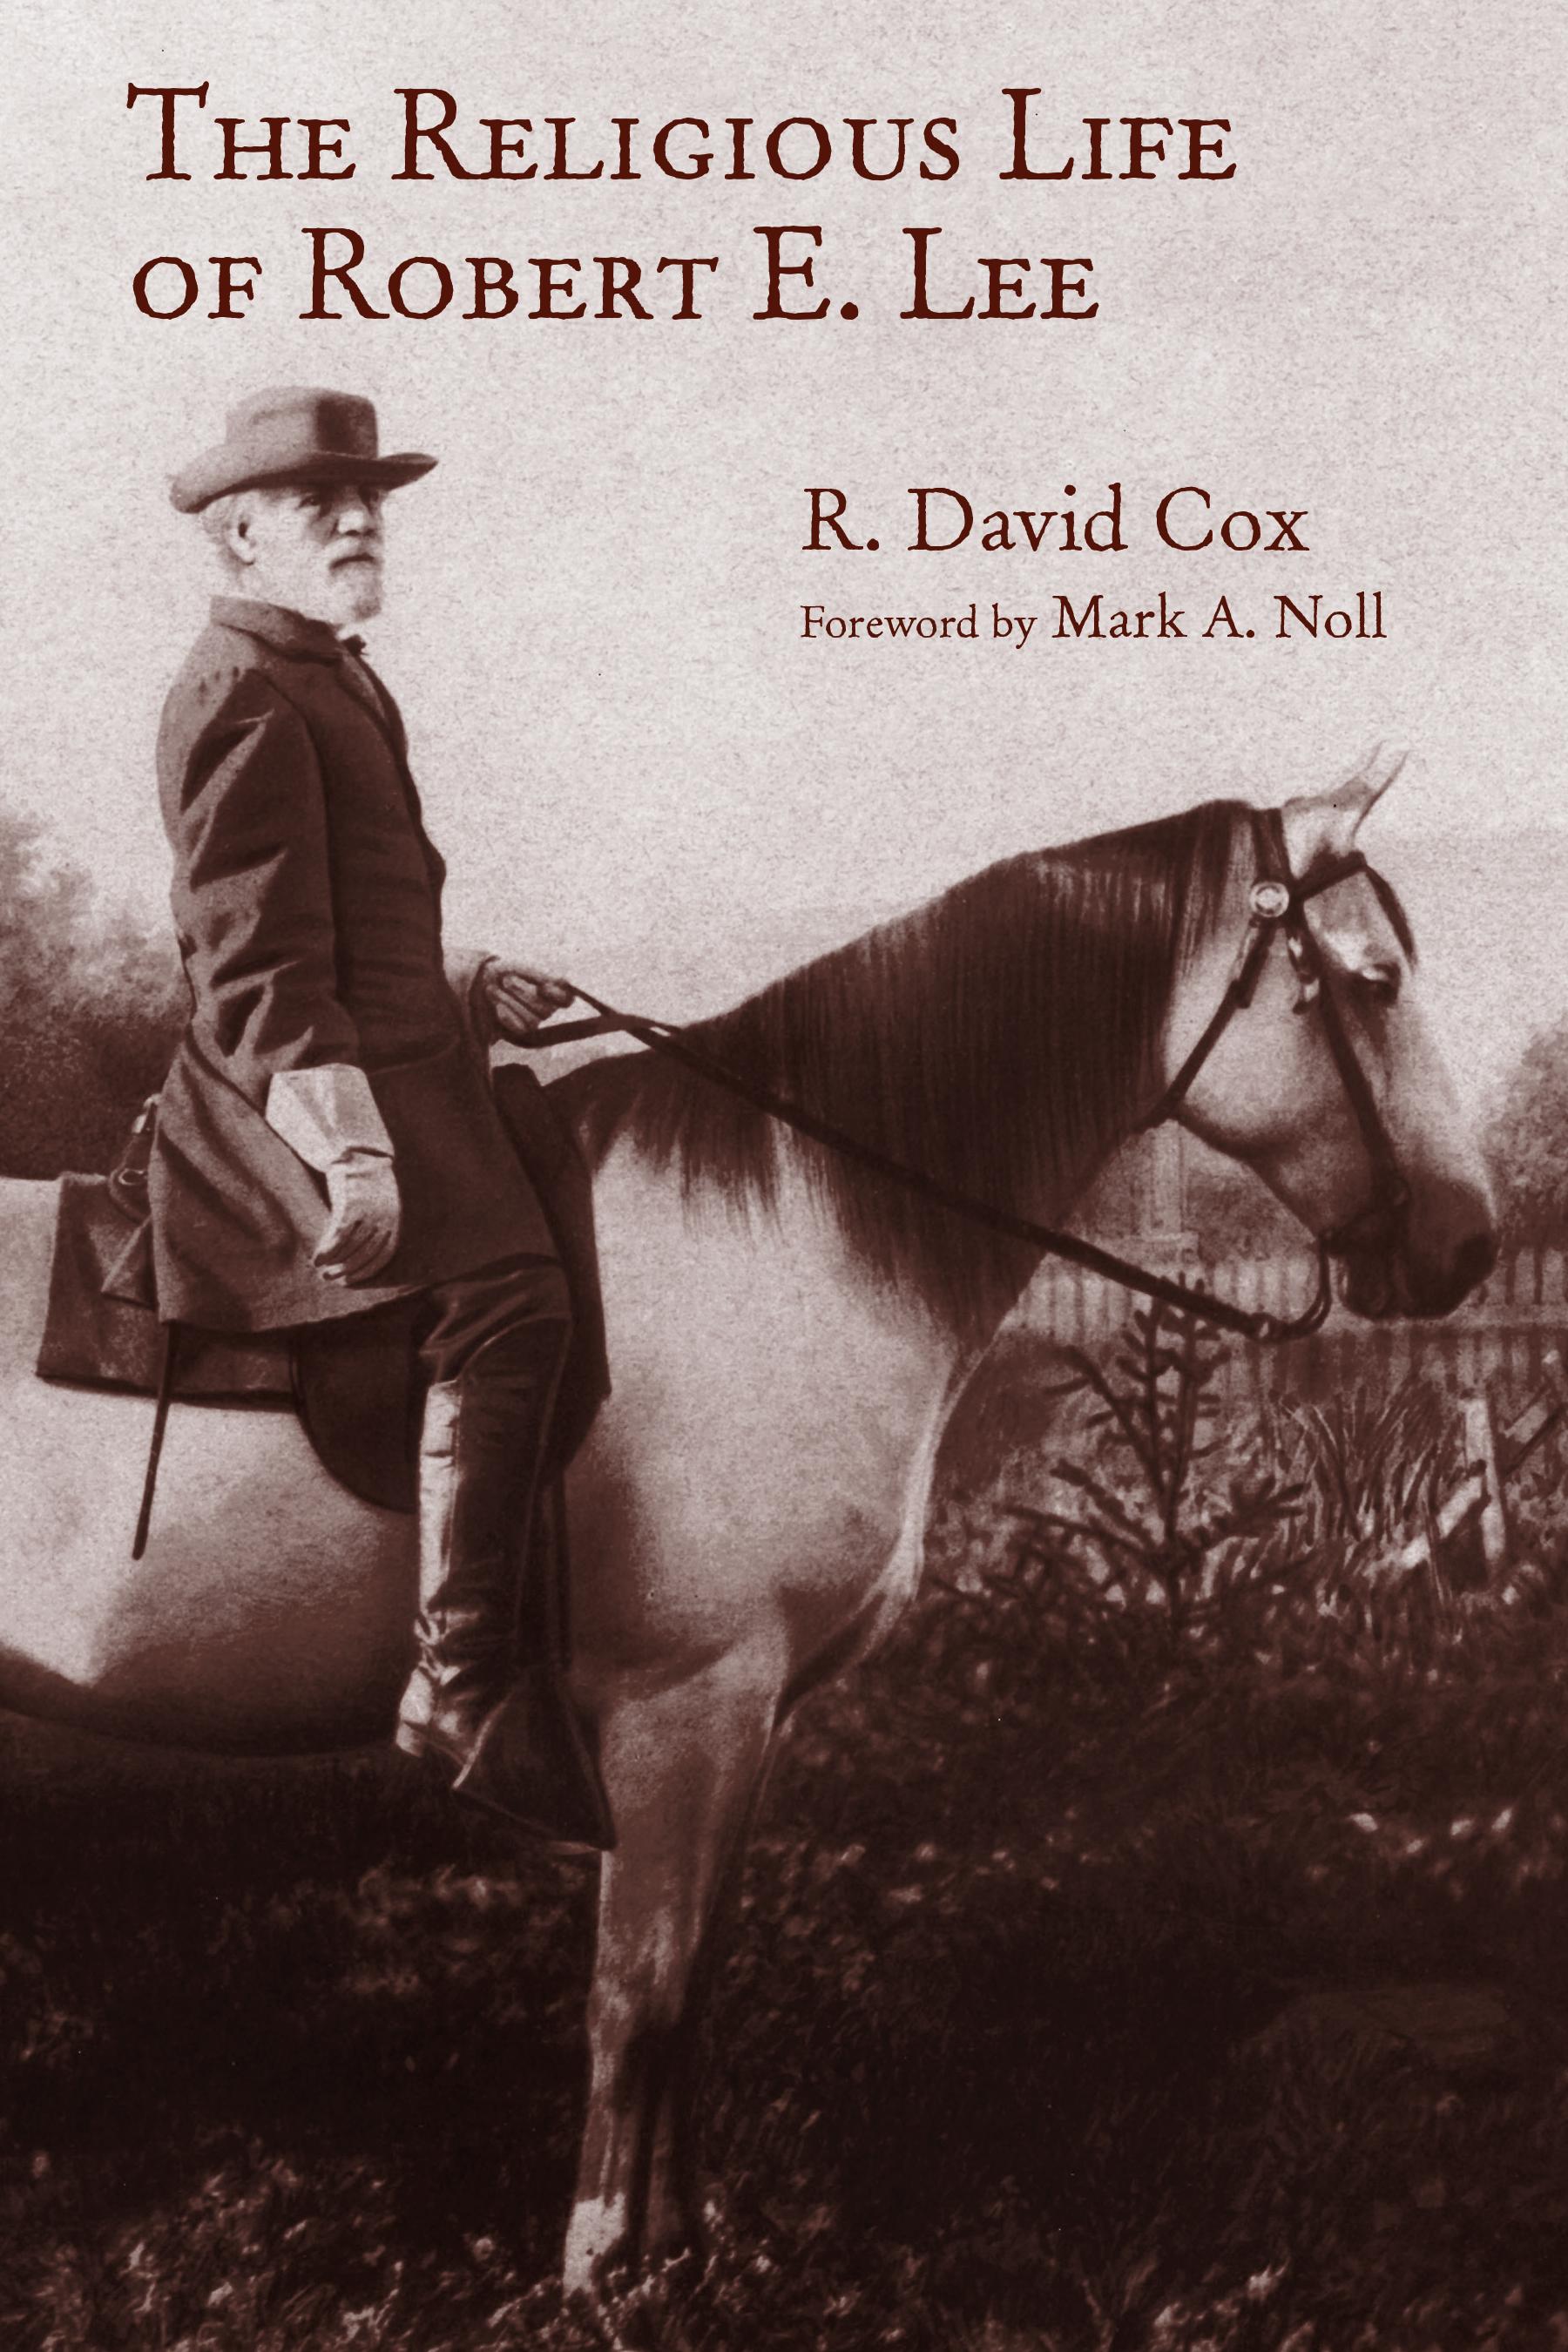 Religious Life of Robert E. Lee